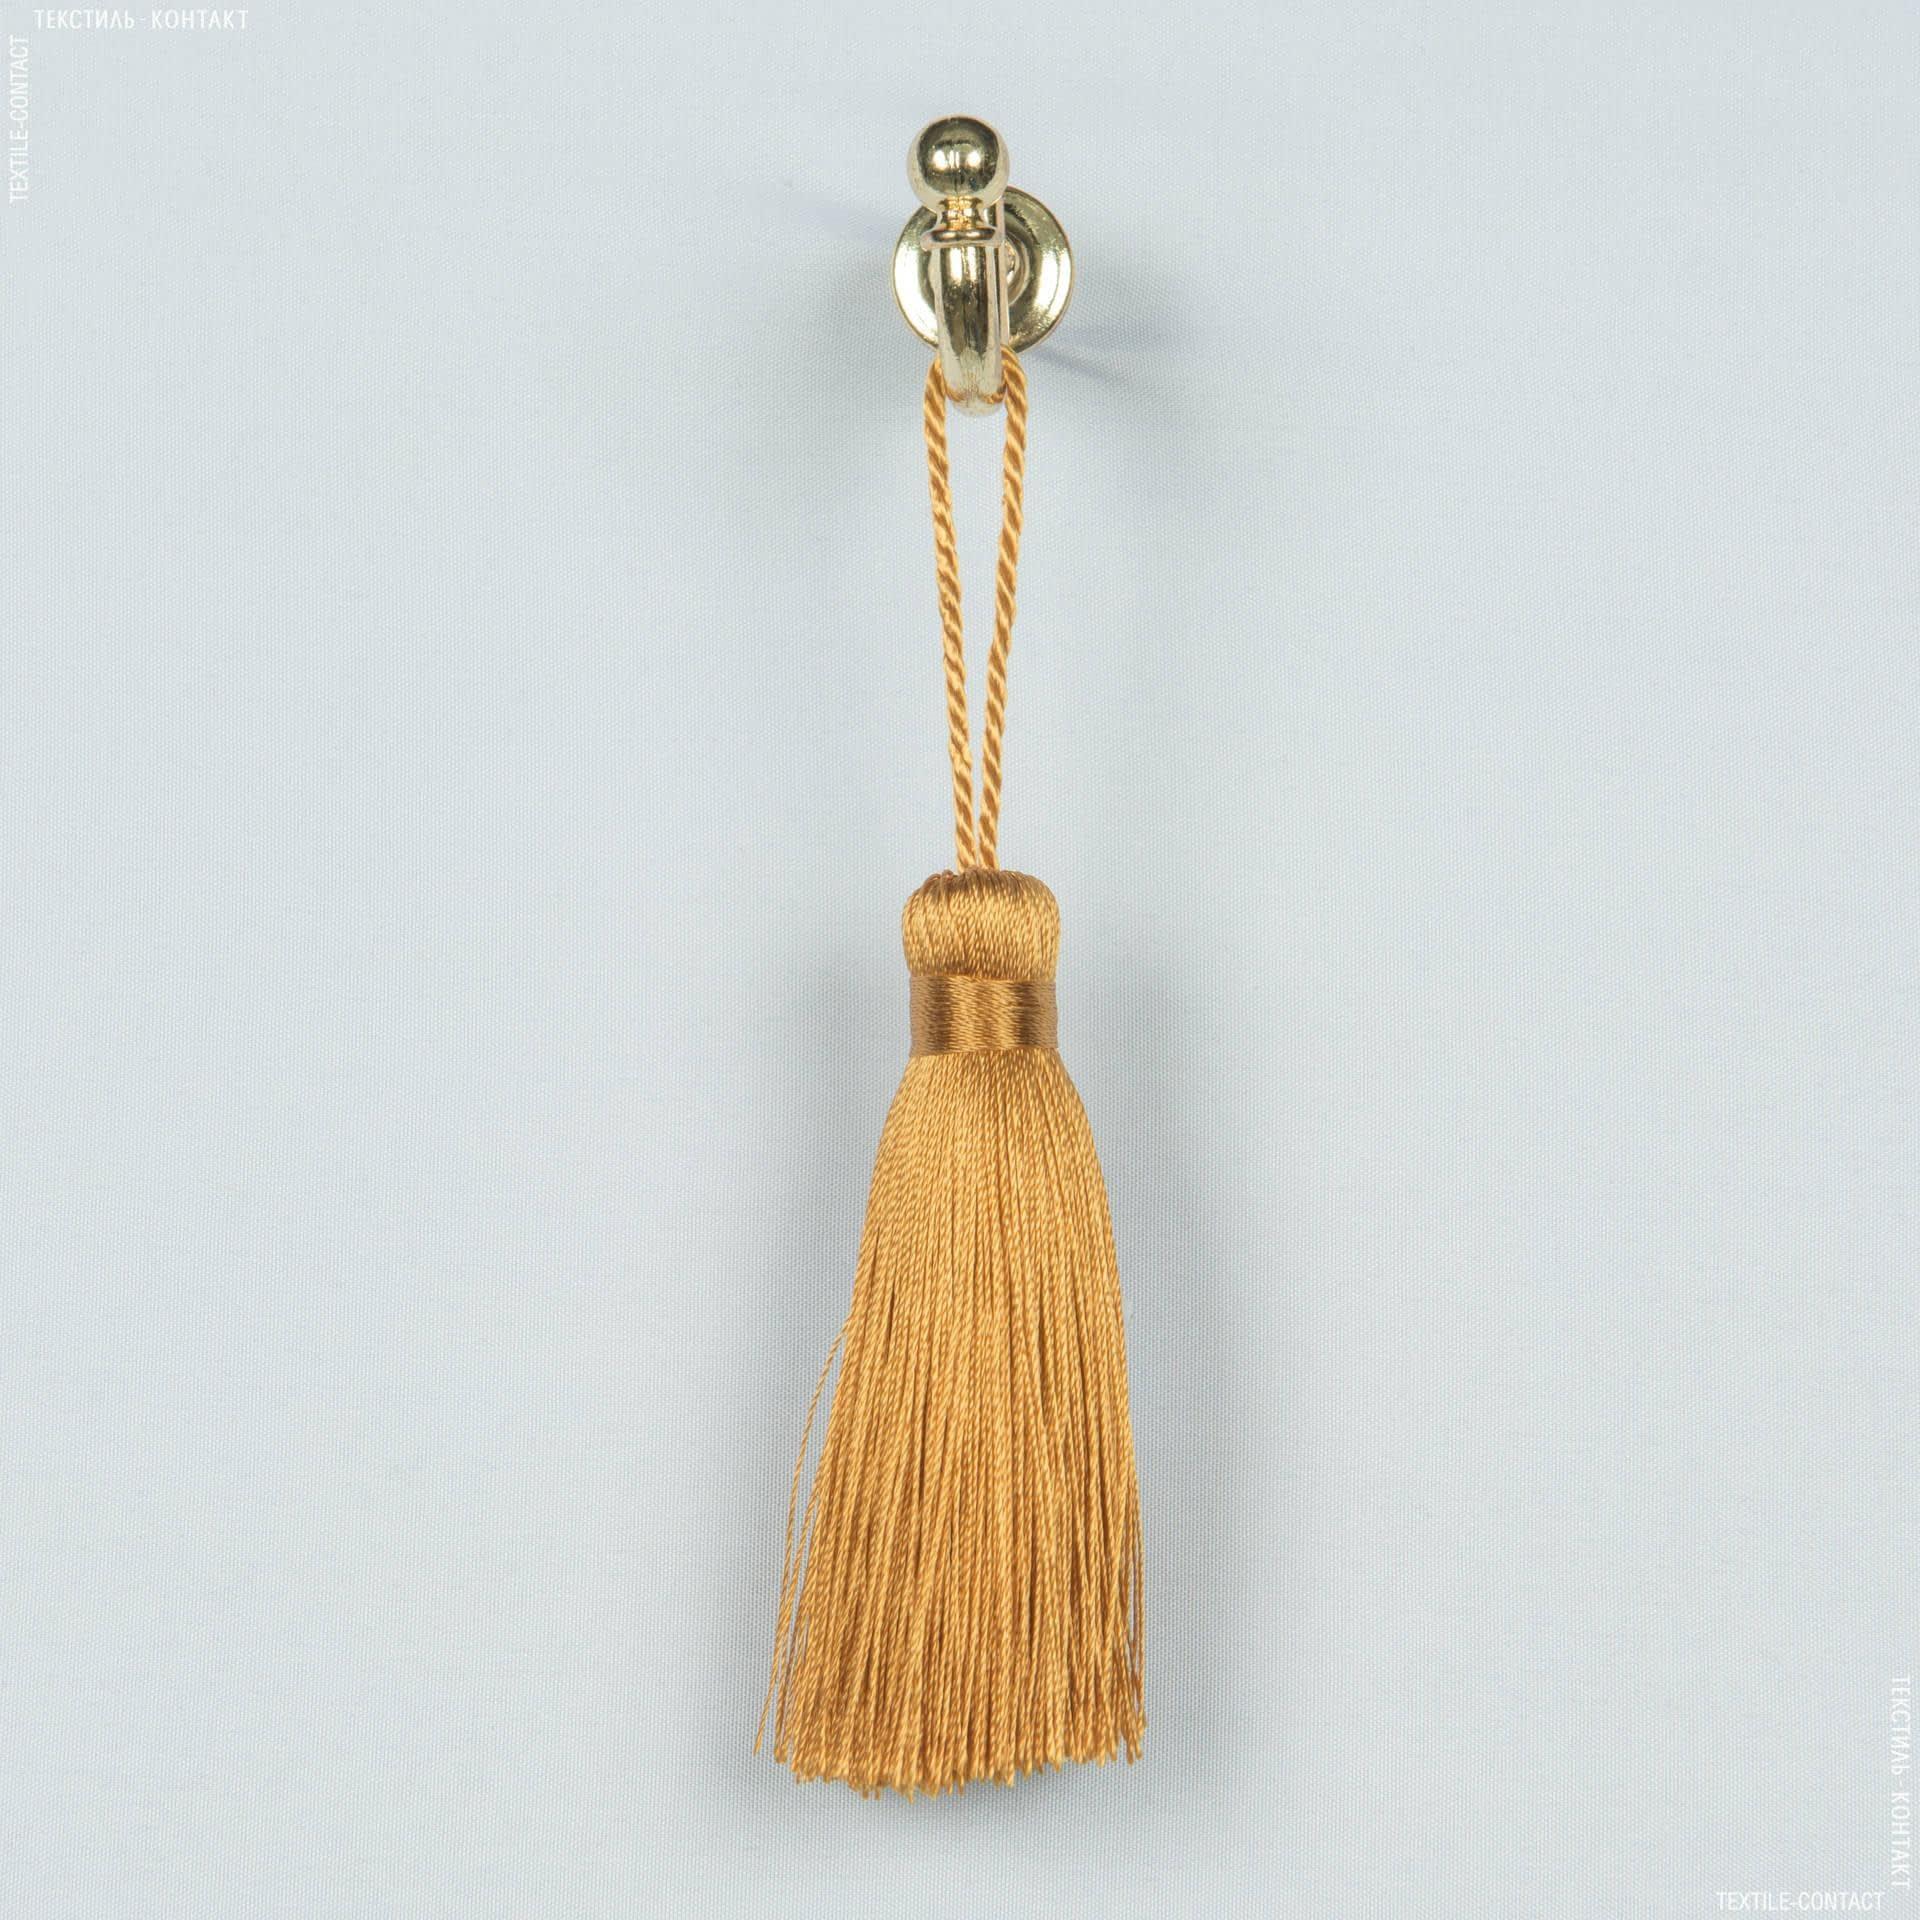 Ткани фурнитура для декора - Кисточка солар яркое золото